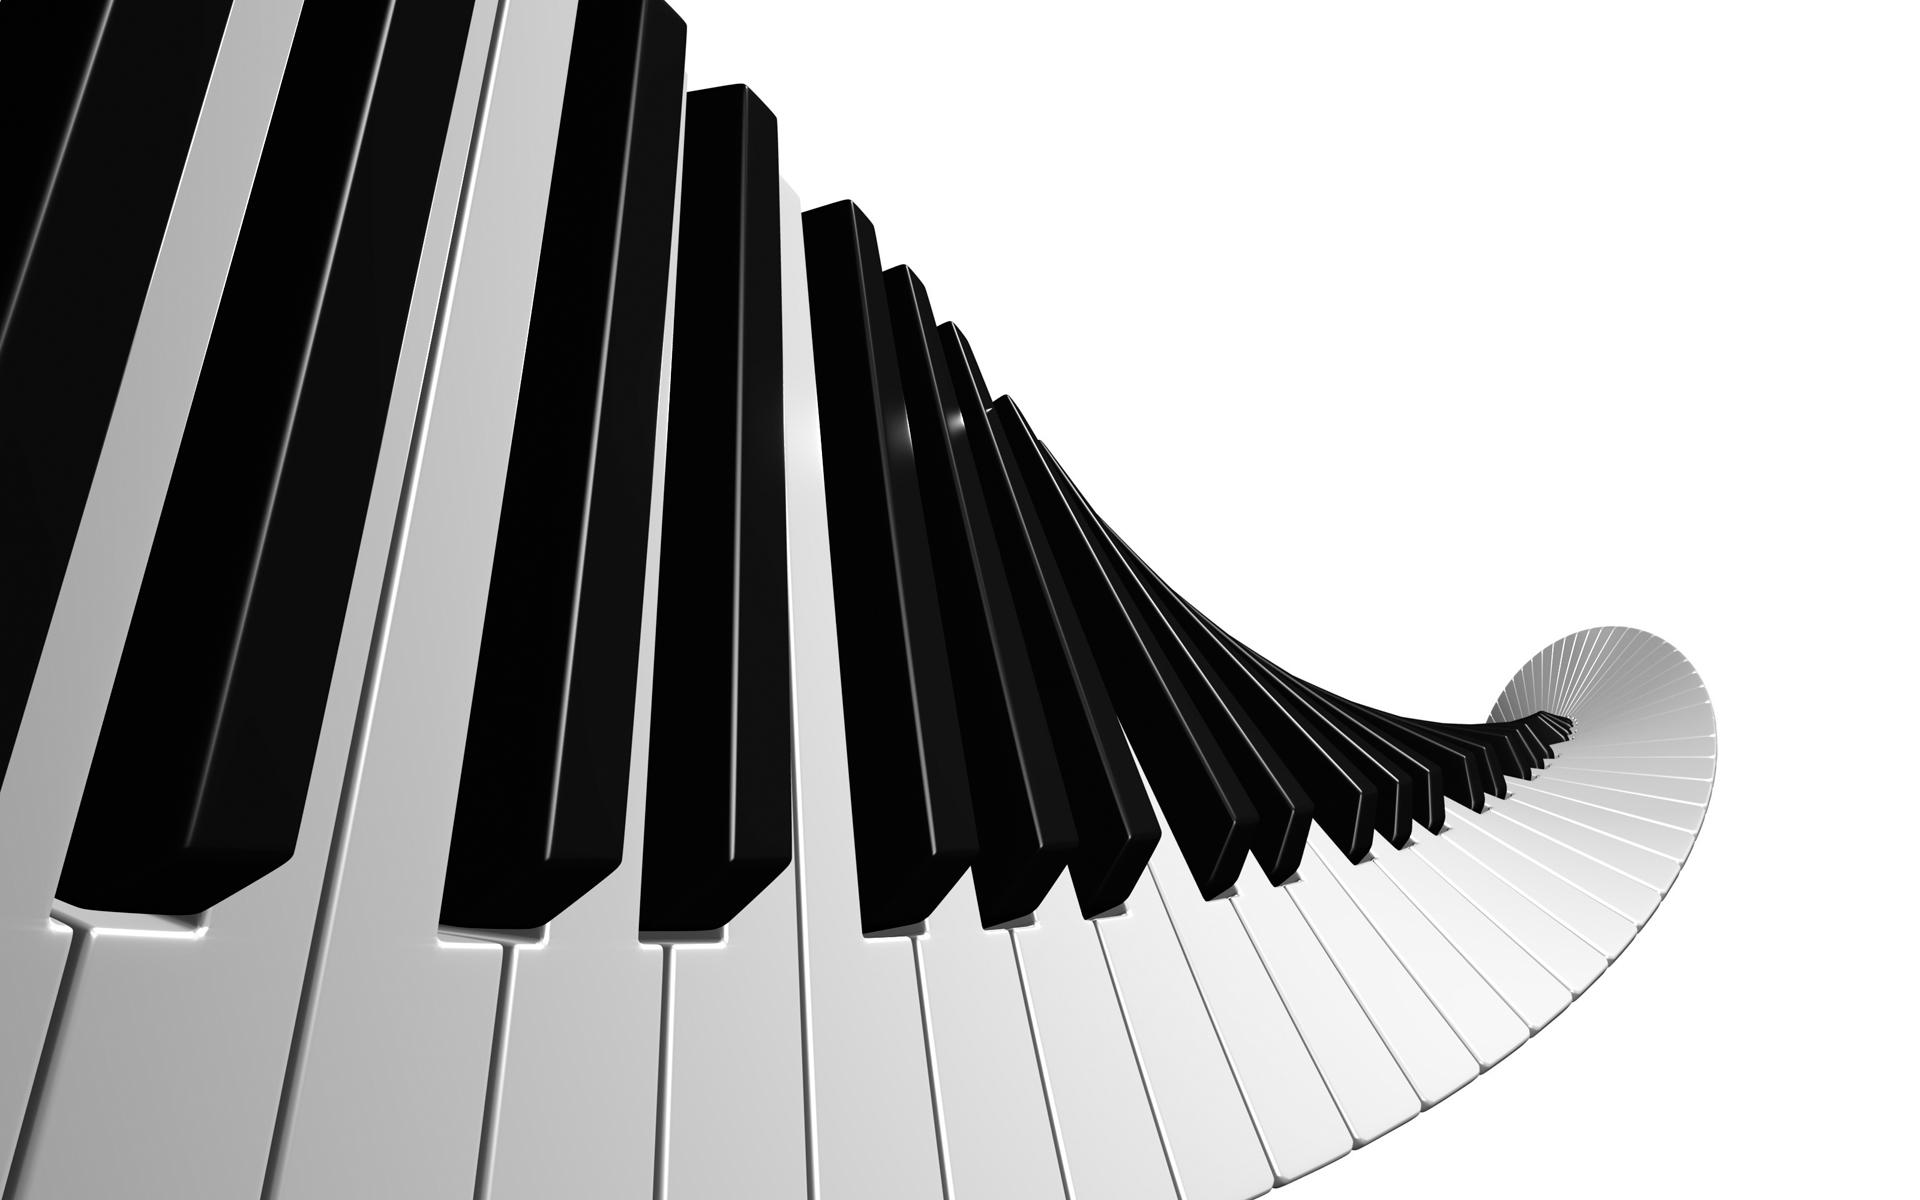 Beautiful Piano Music Wallpapers HD